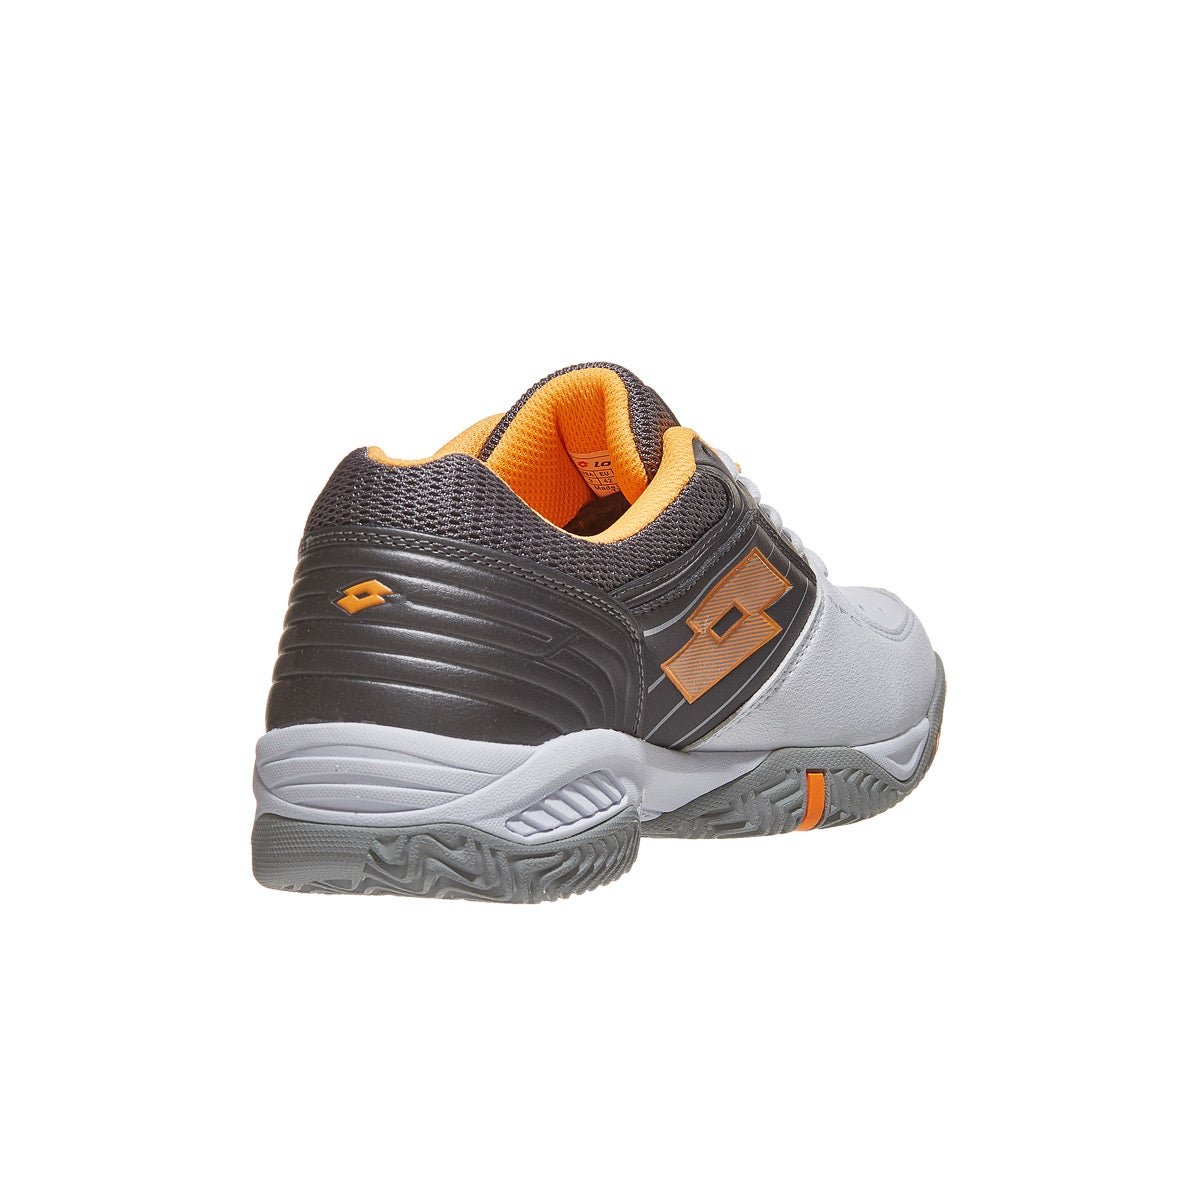 new style ffc5a e4024 Lotto T-Tour 600 X White Grey Orange Men s Shoe 360° View